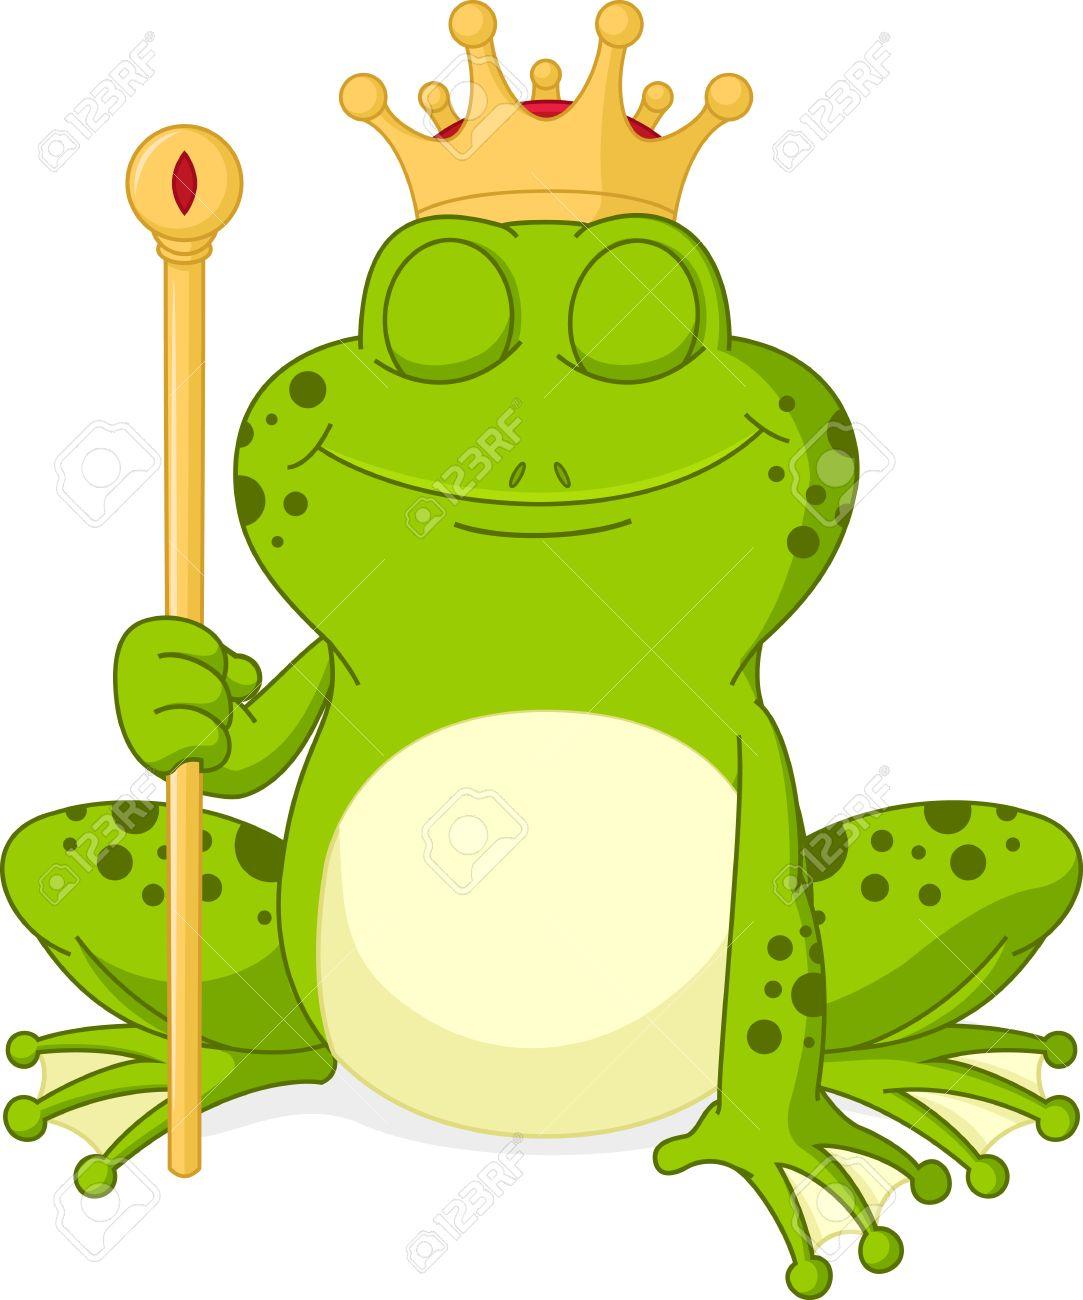 Uncategorized Principe Sapo sapo dos desenhos animados royalty free cliparts vetores imagens 35815479